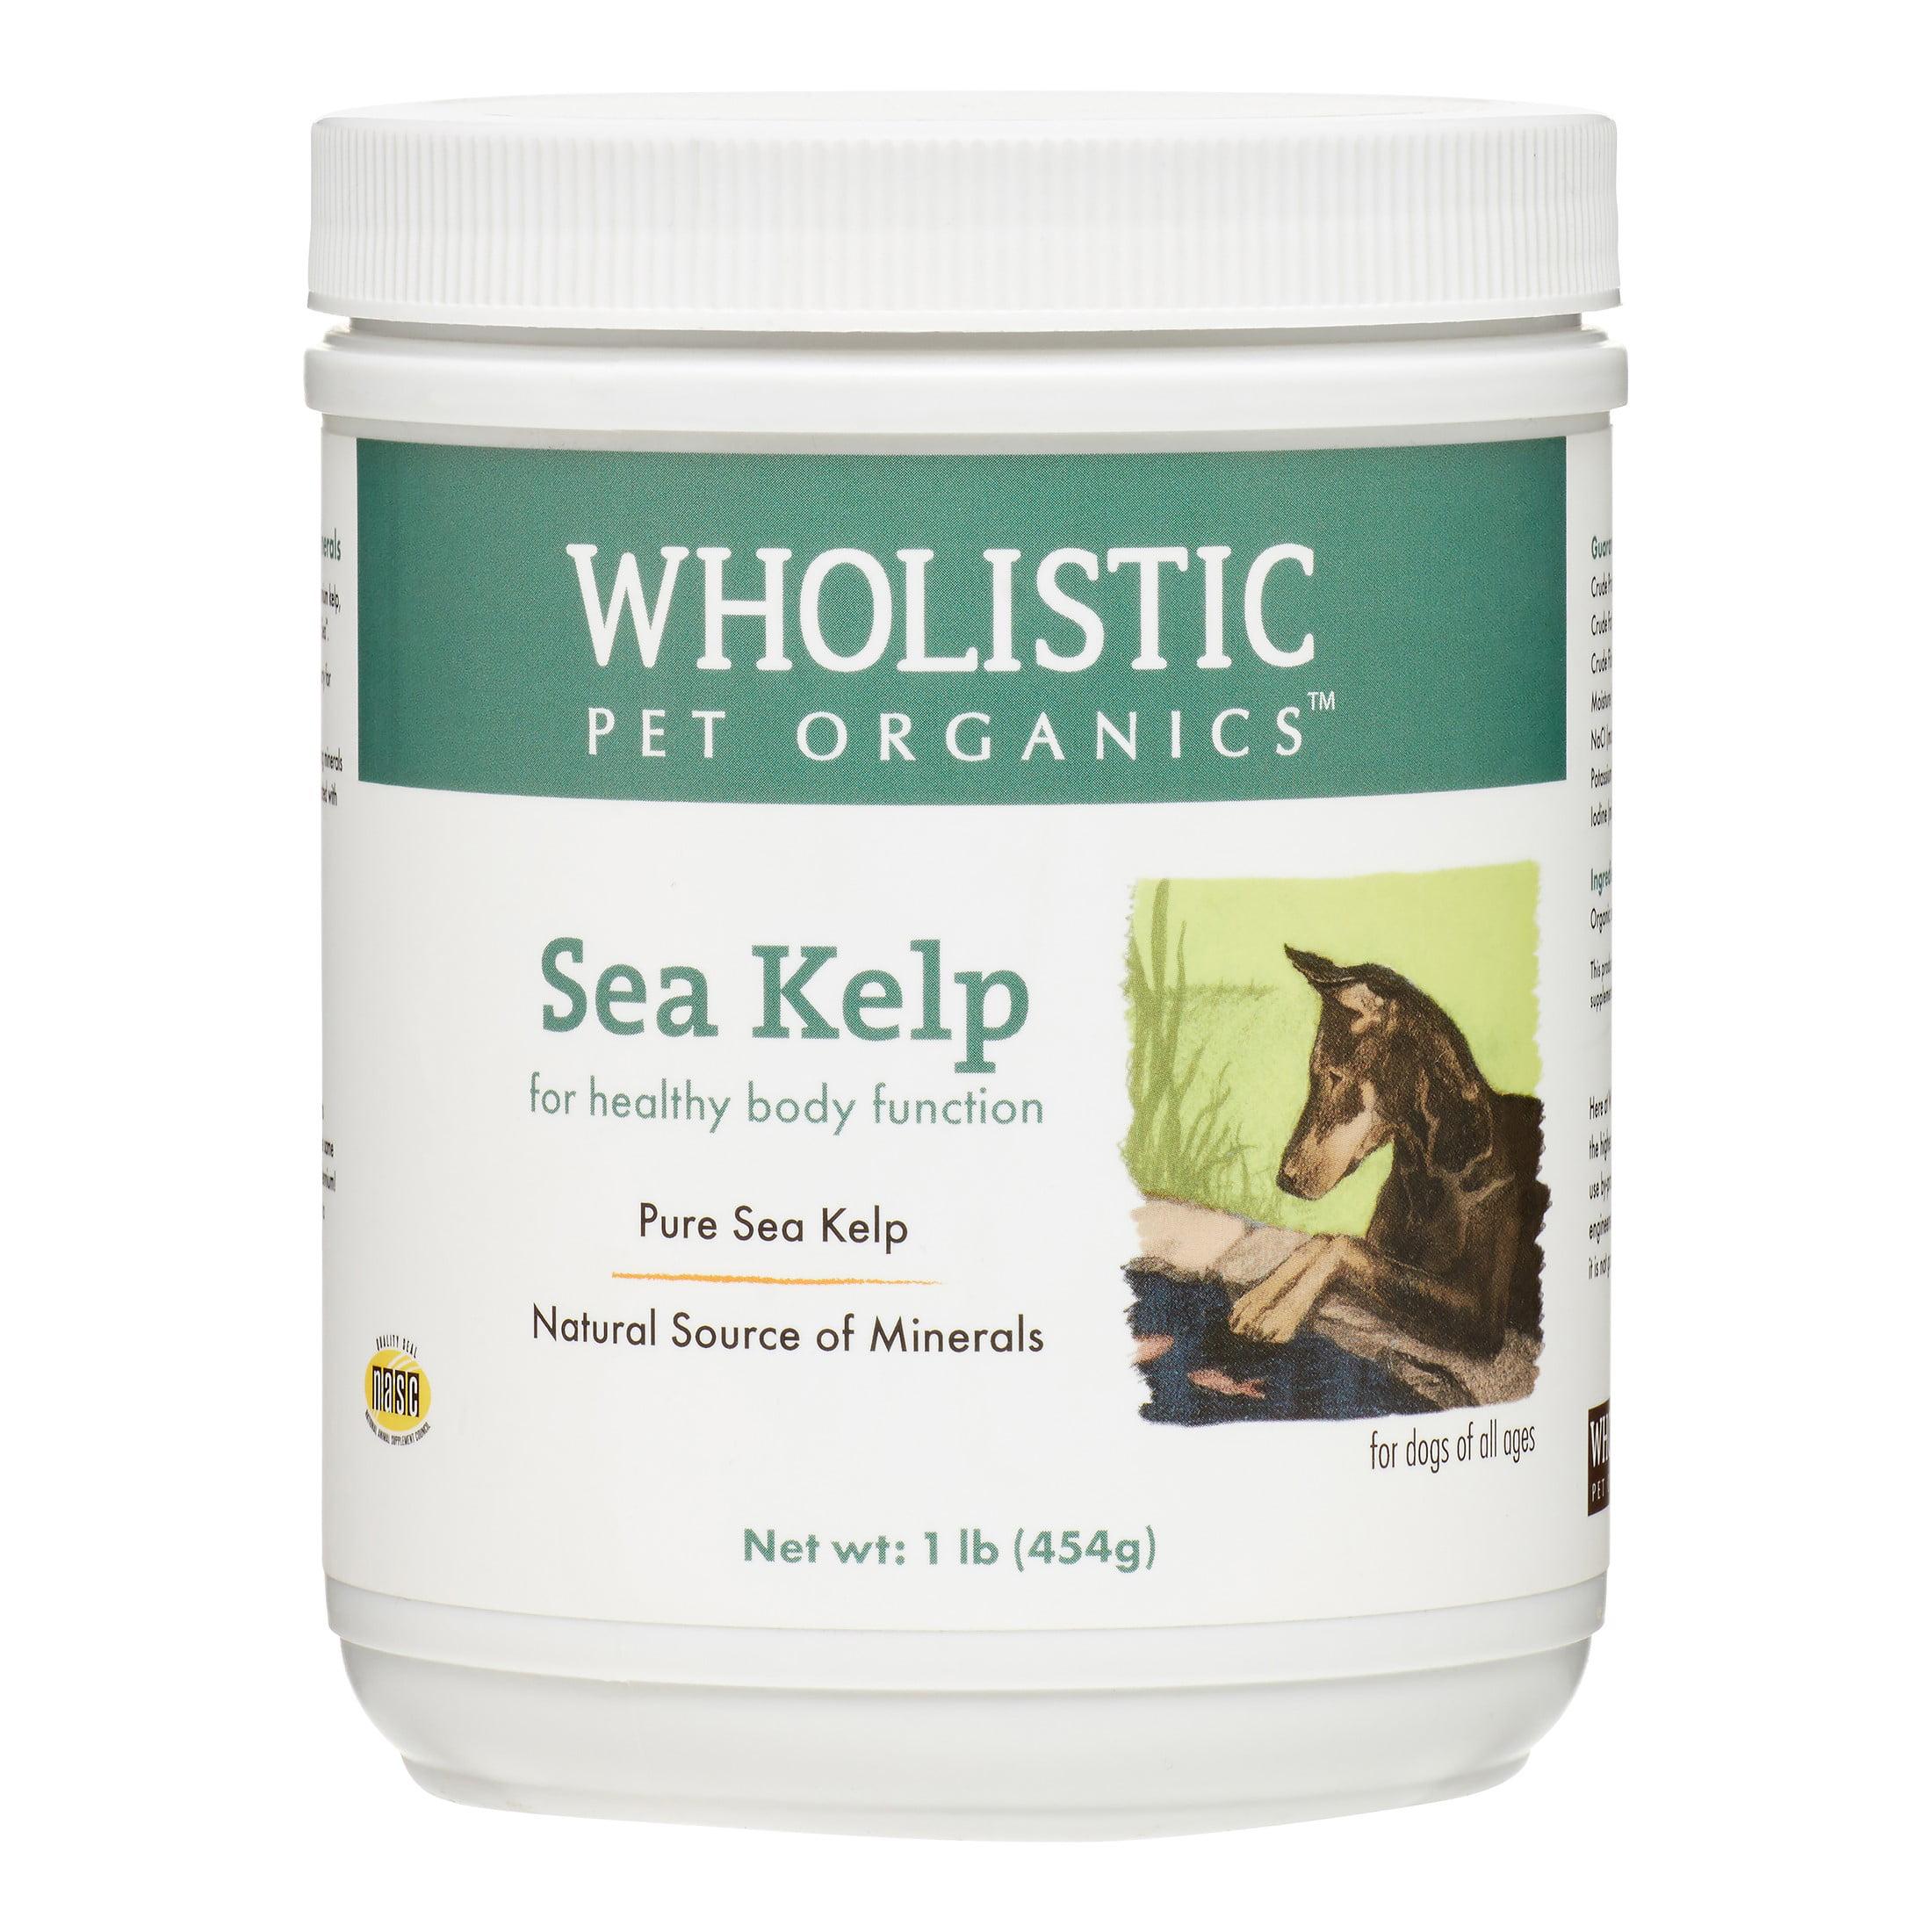 Wholistic Pet Organics Sea Kelp Healthy Body Function Dog Supplement, 1 Lb